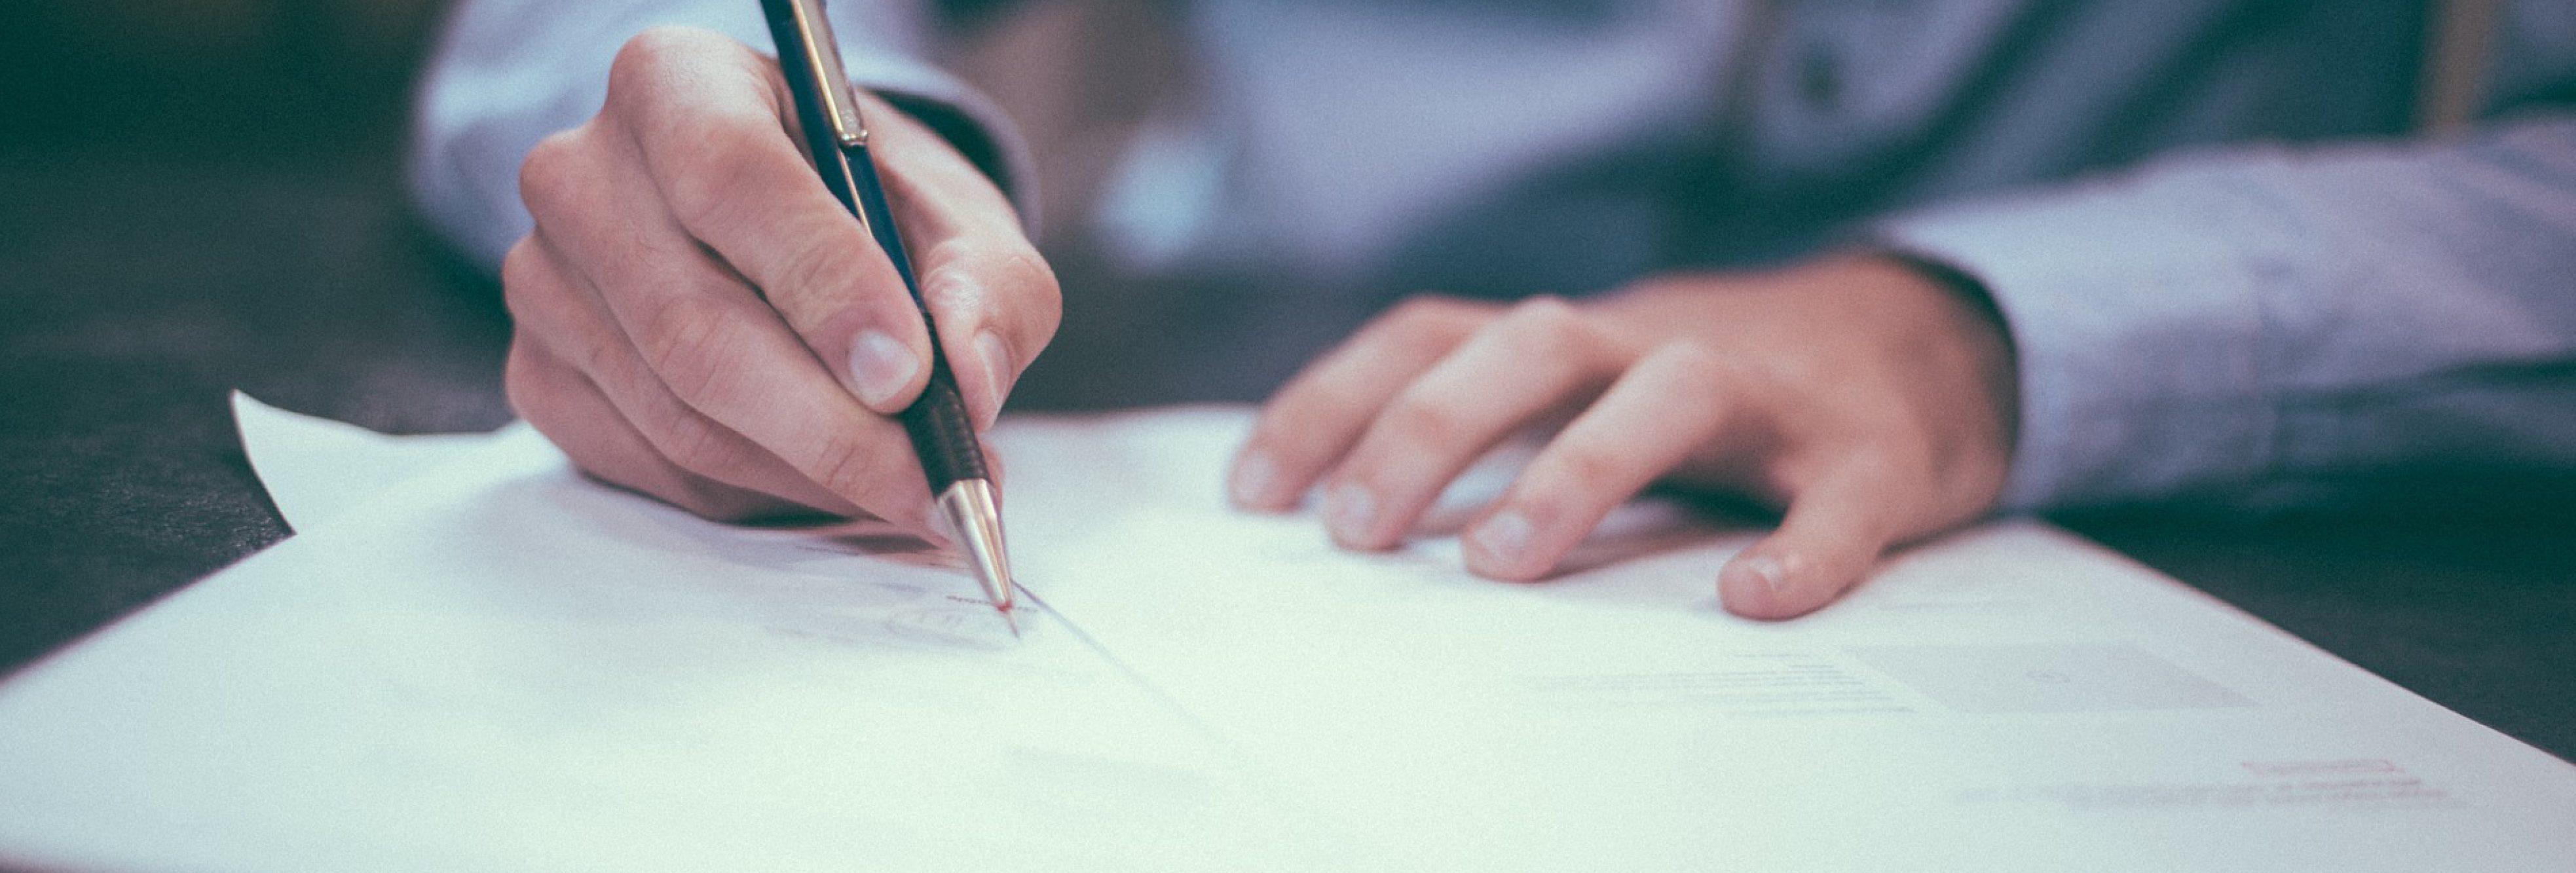 Signature contrat apprentissage